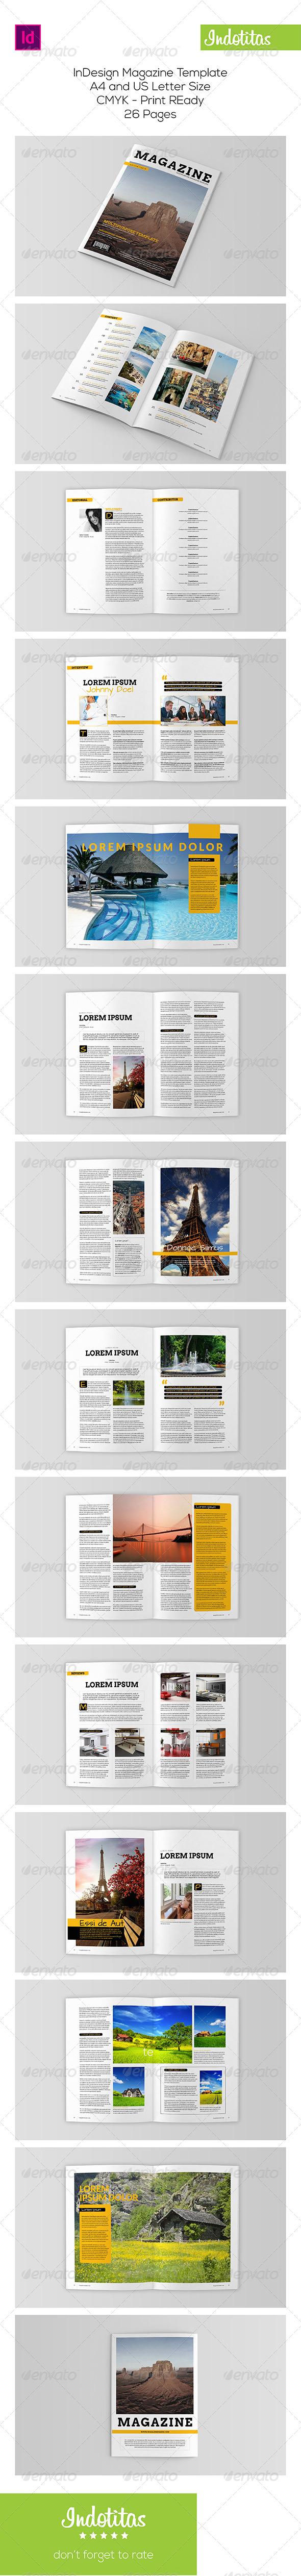 GraphicRiver Indesign Magazine Template 8003145